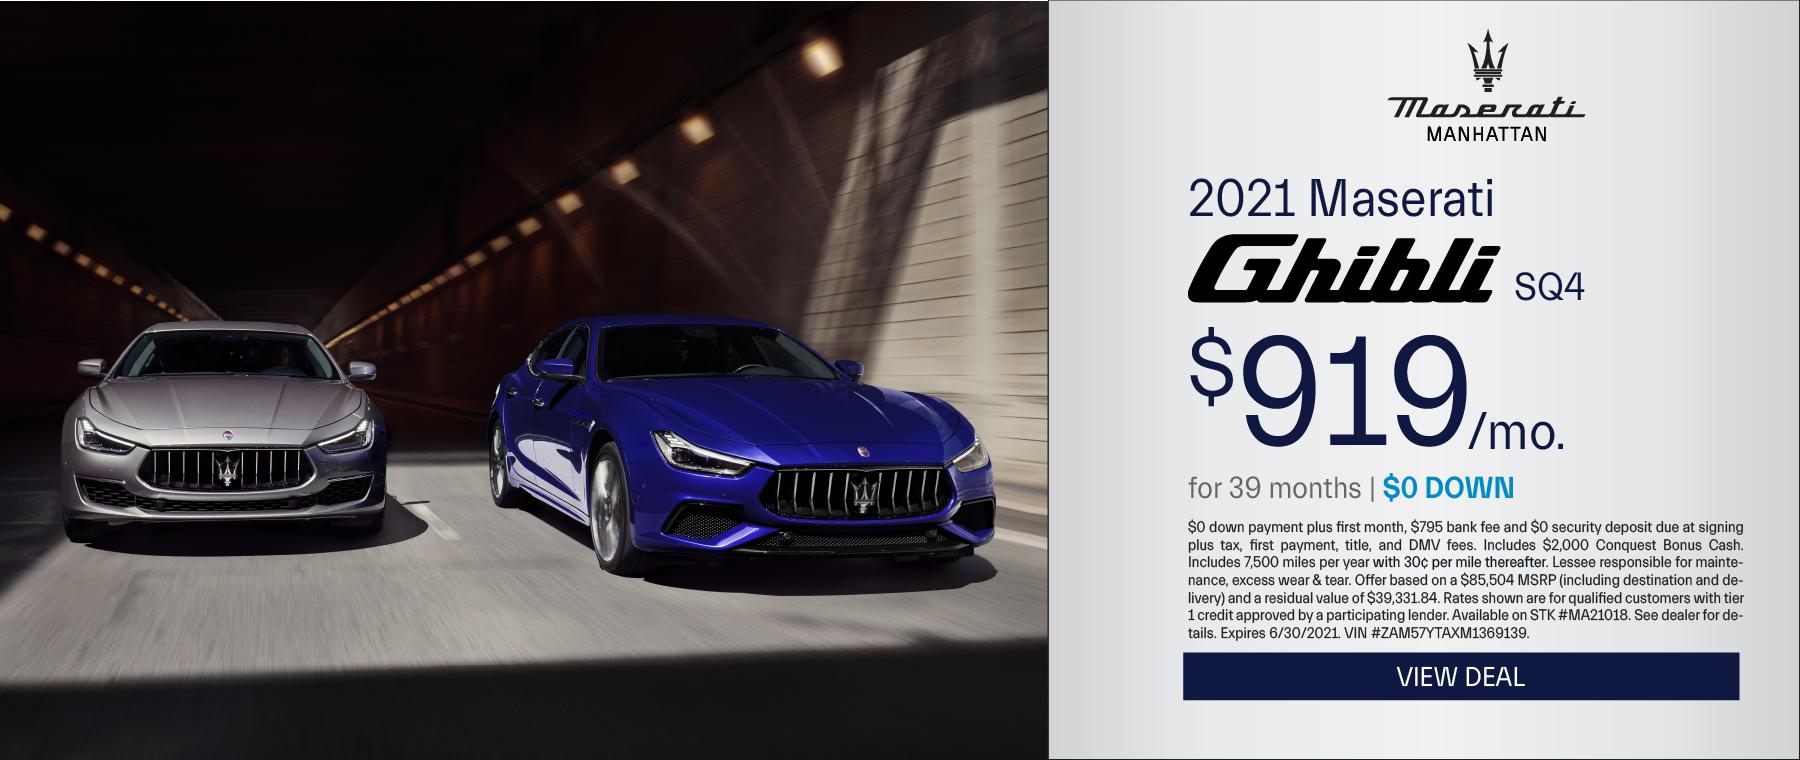 Maserati of Manhattan – 2021 Ghibli – June 2021